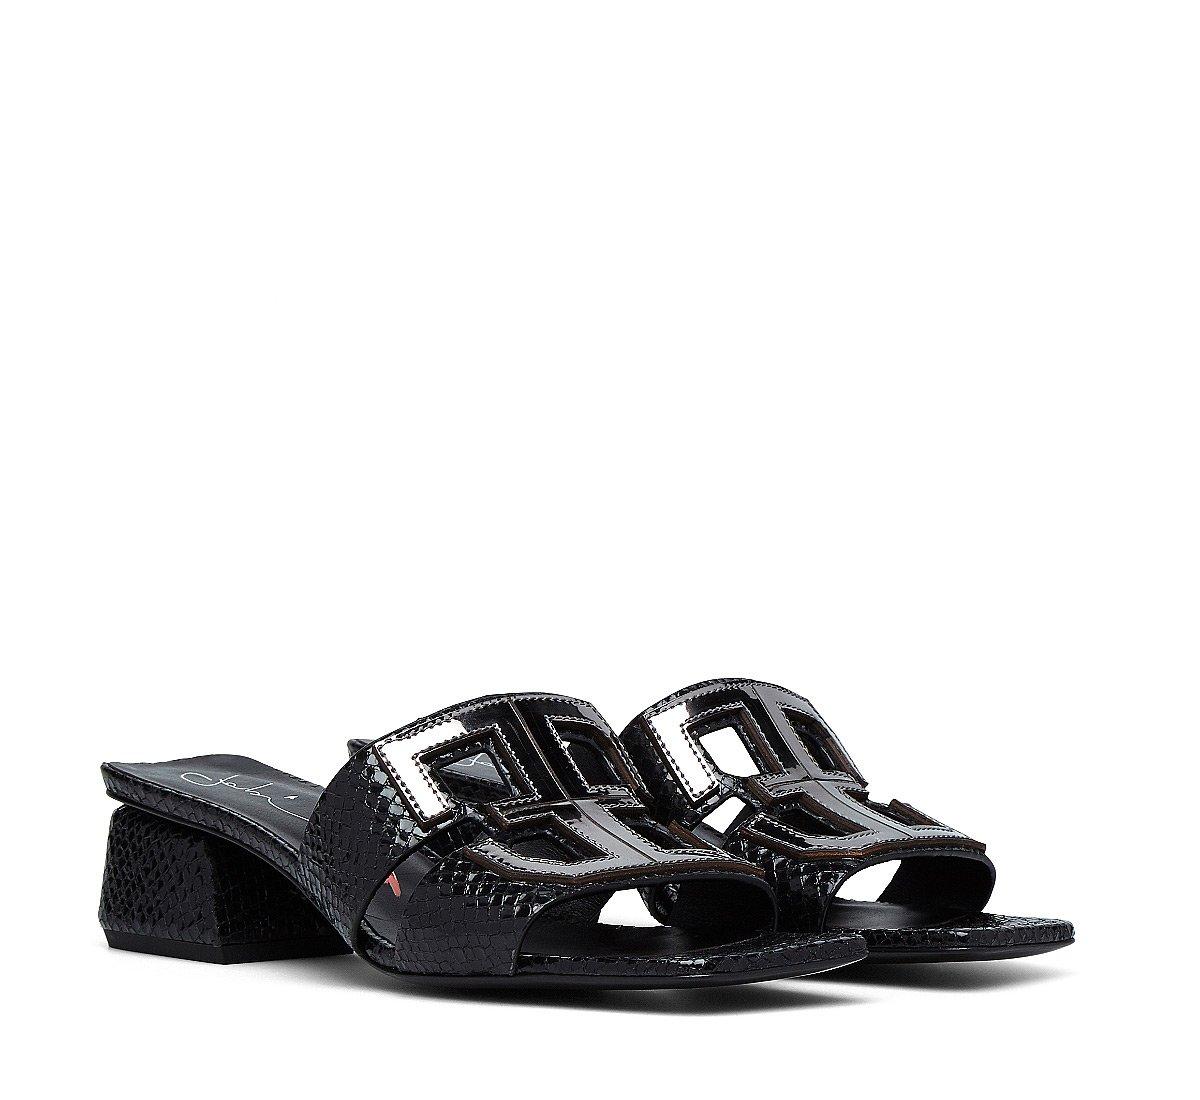 Sandals in reptile-print calfskin